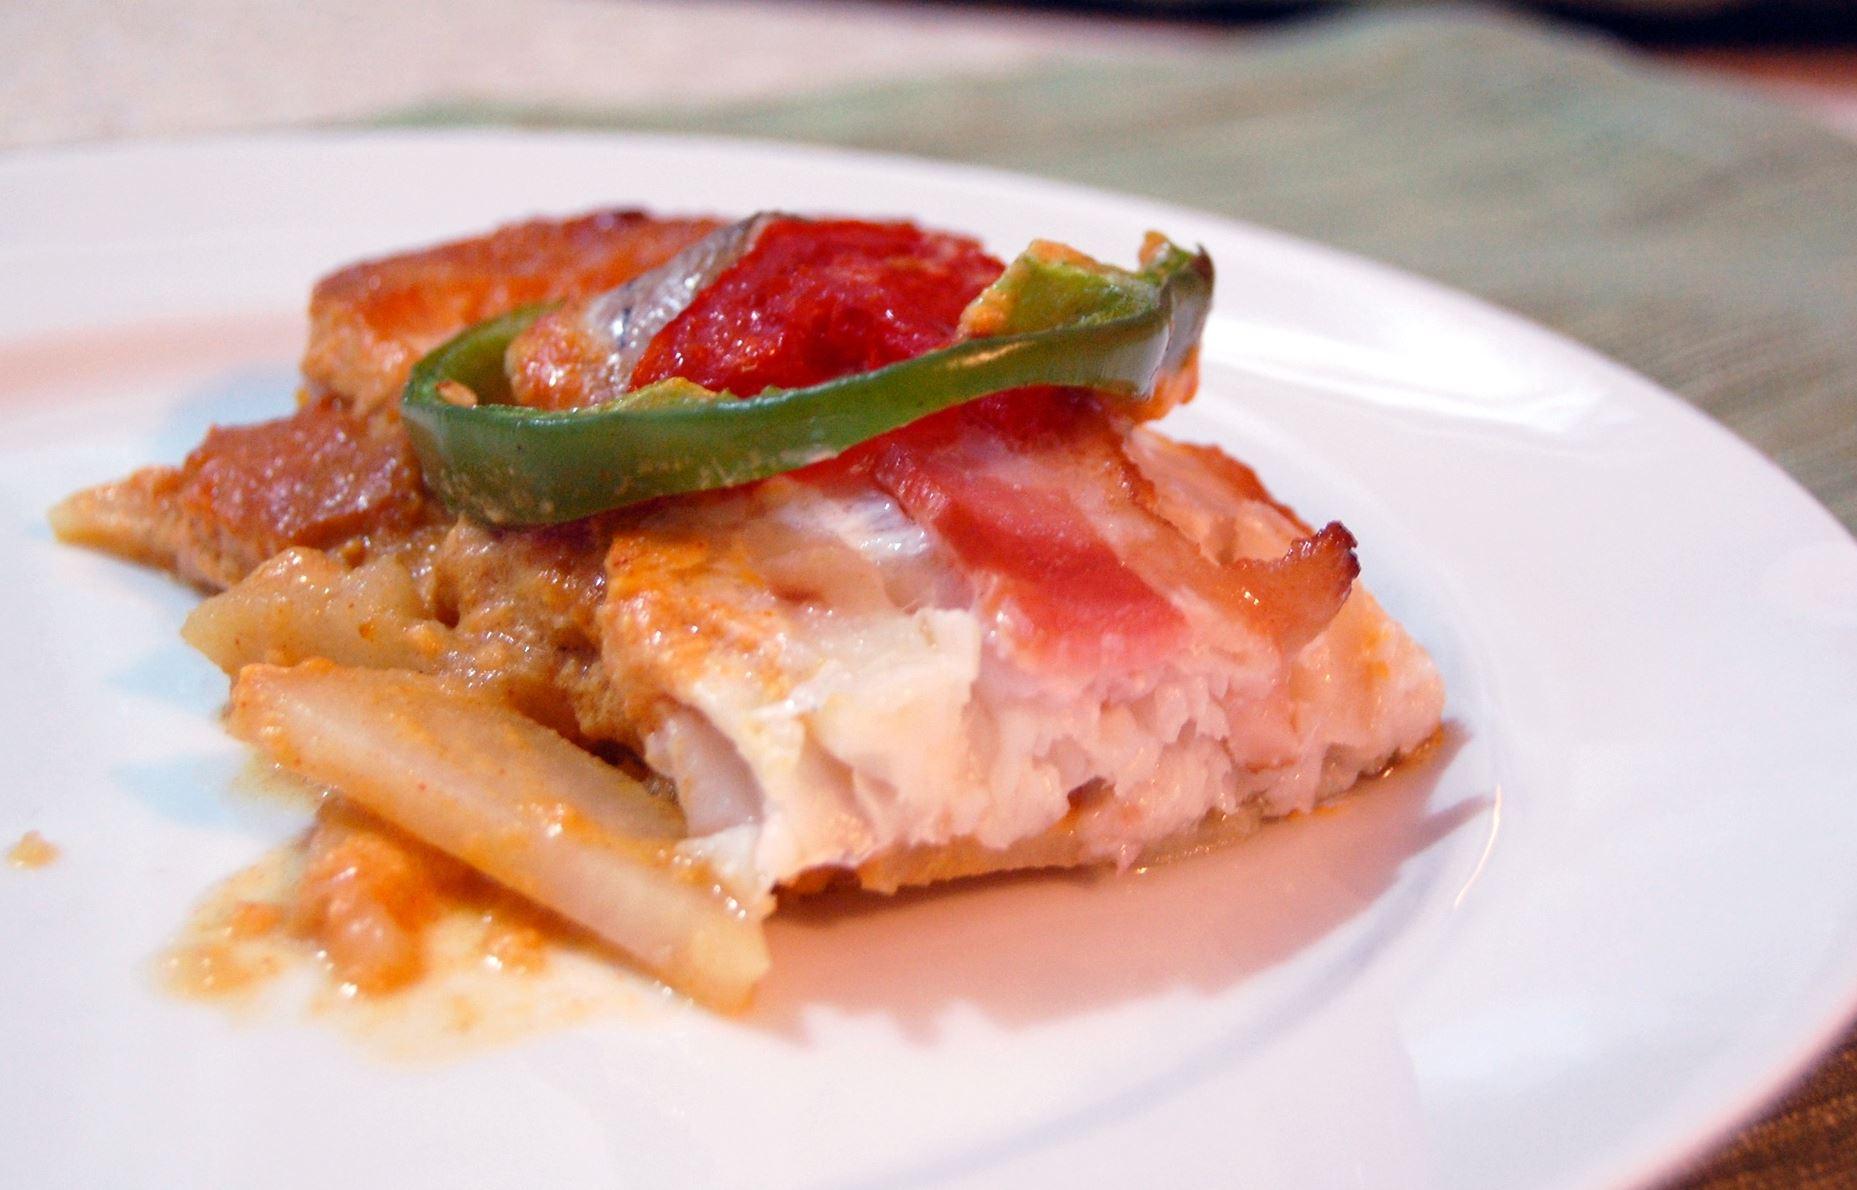 20131212hofishfood0290 Fish Paprikash Christmas Casserole.